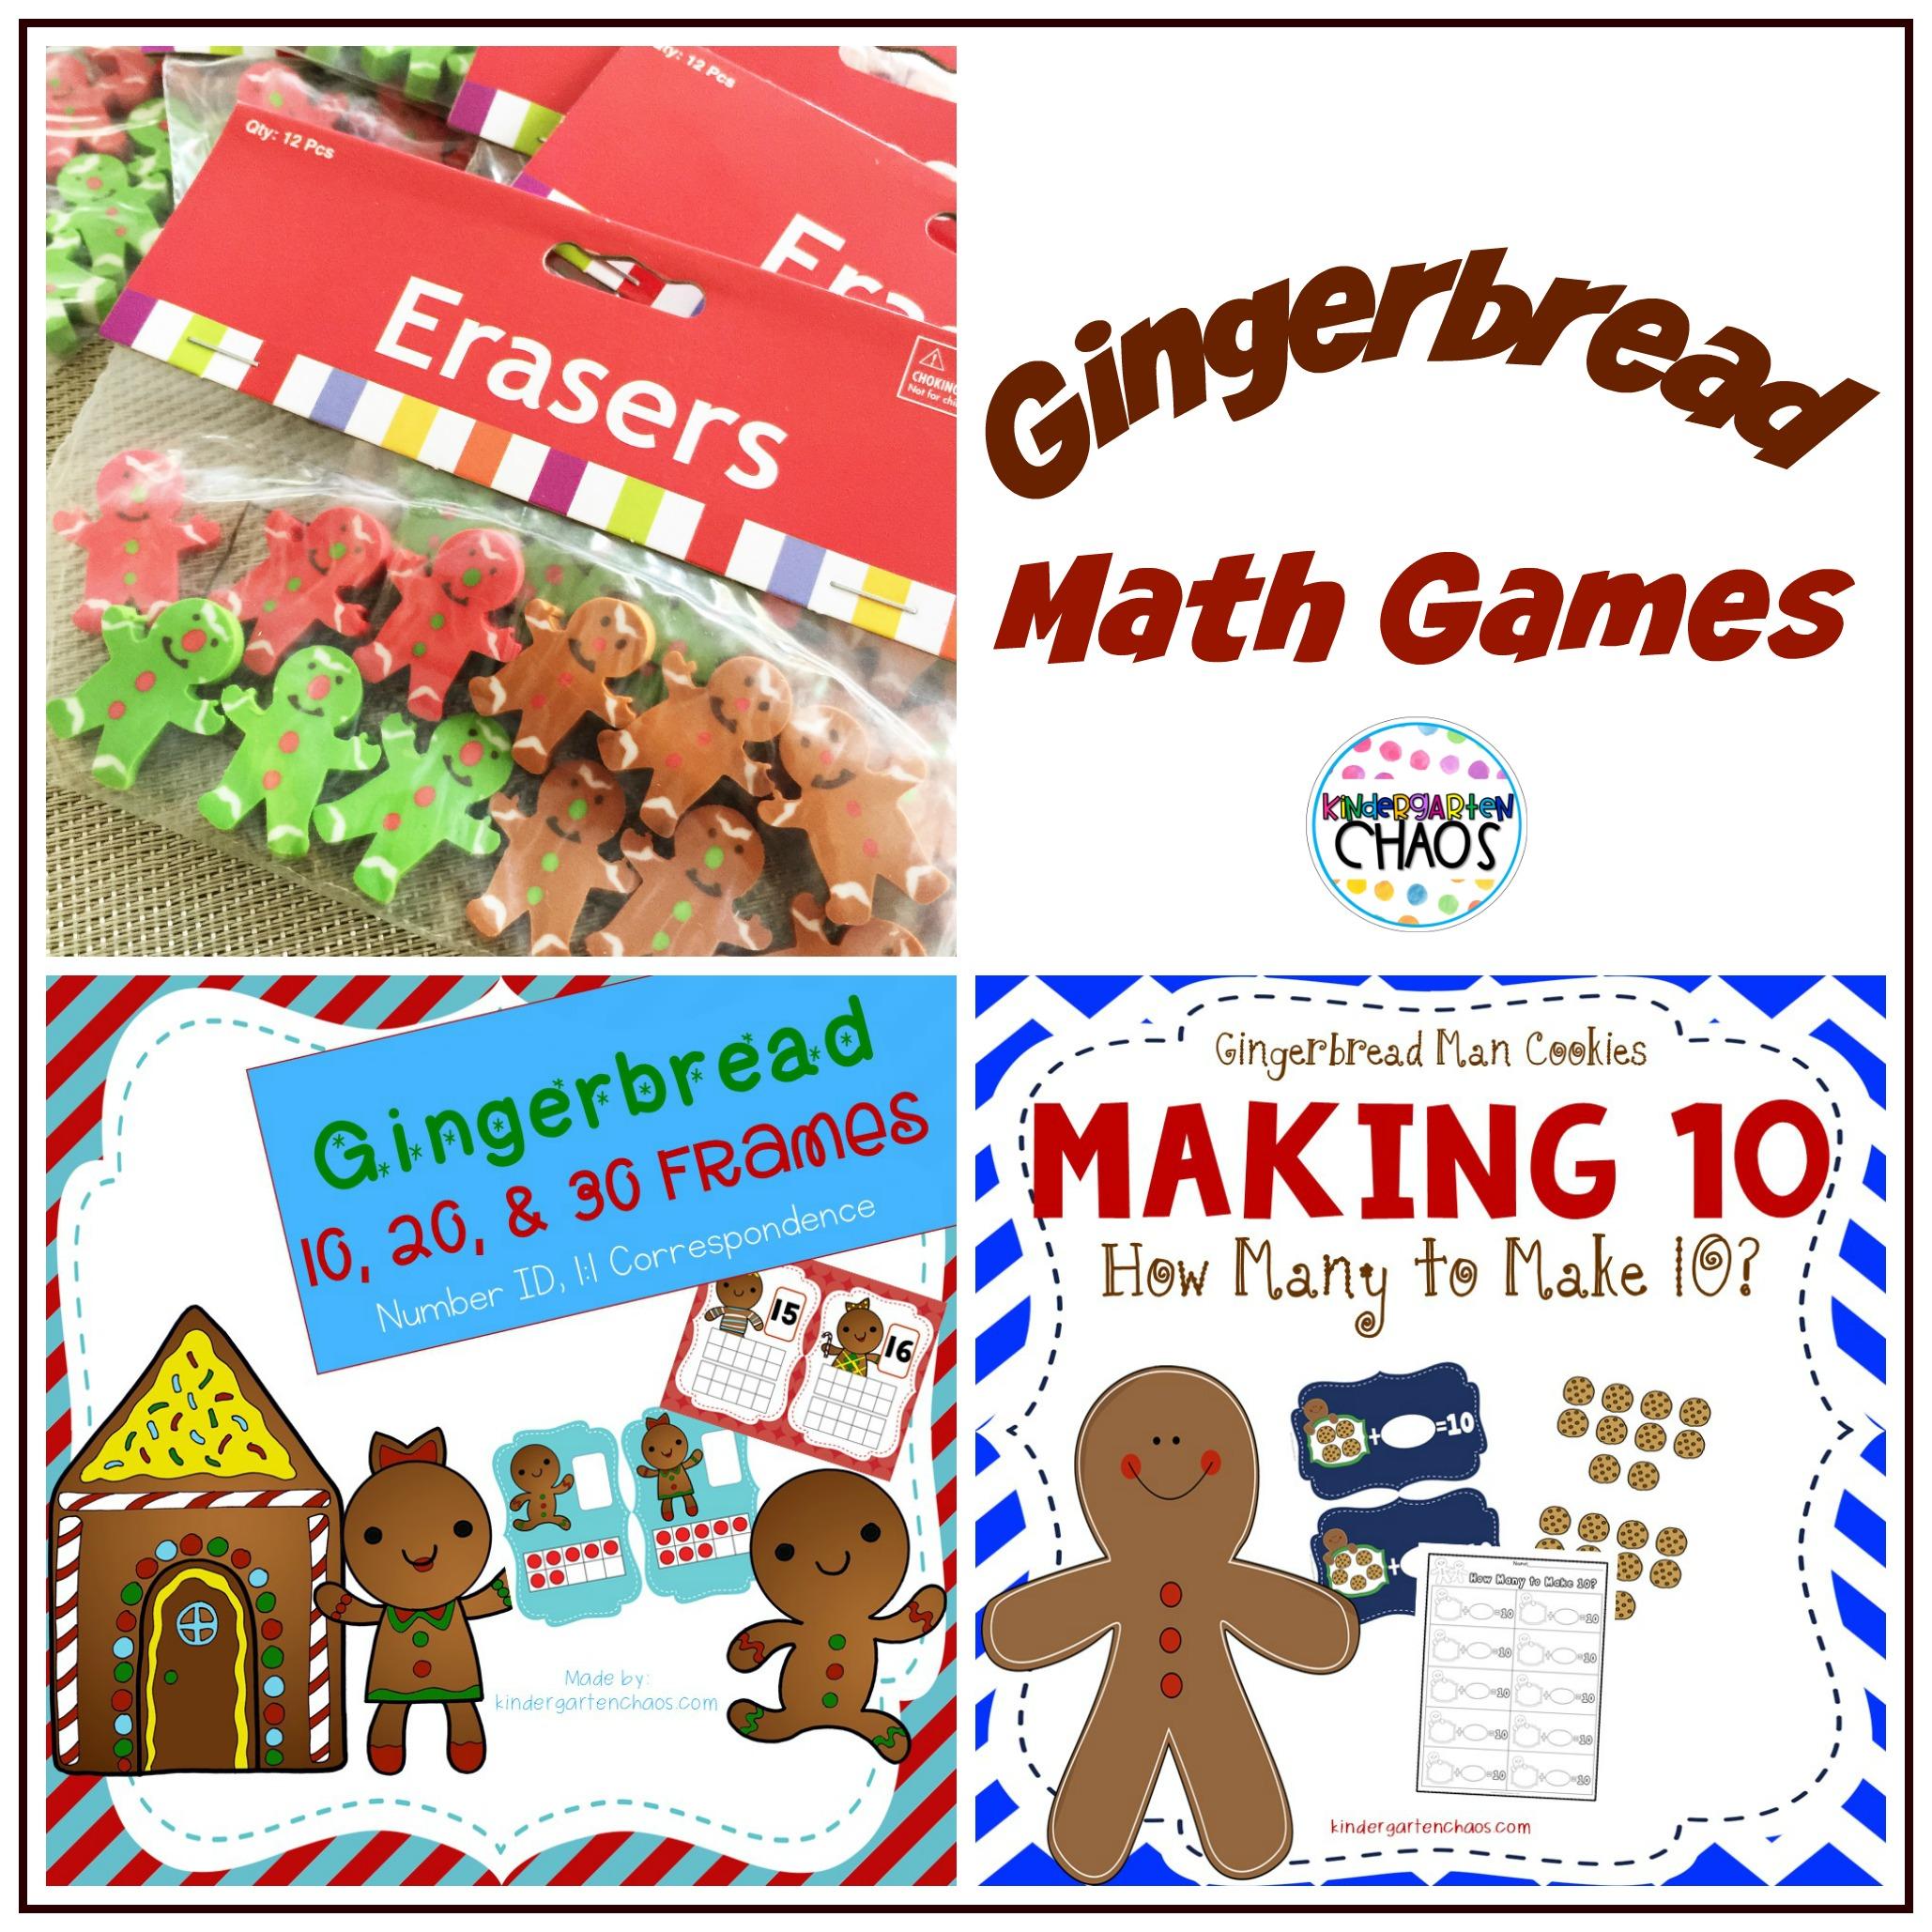 Gingerbread Math Games